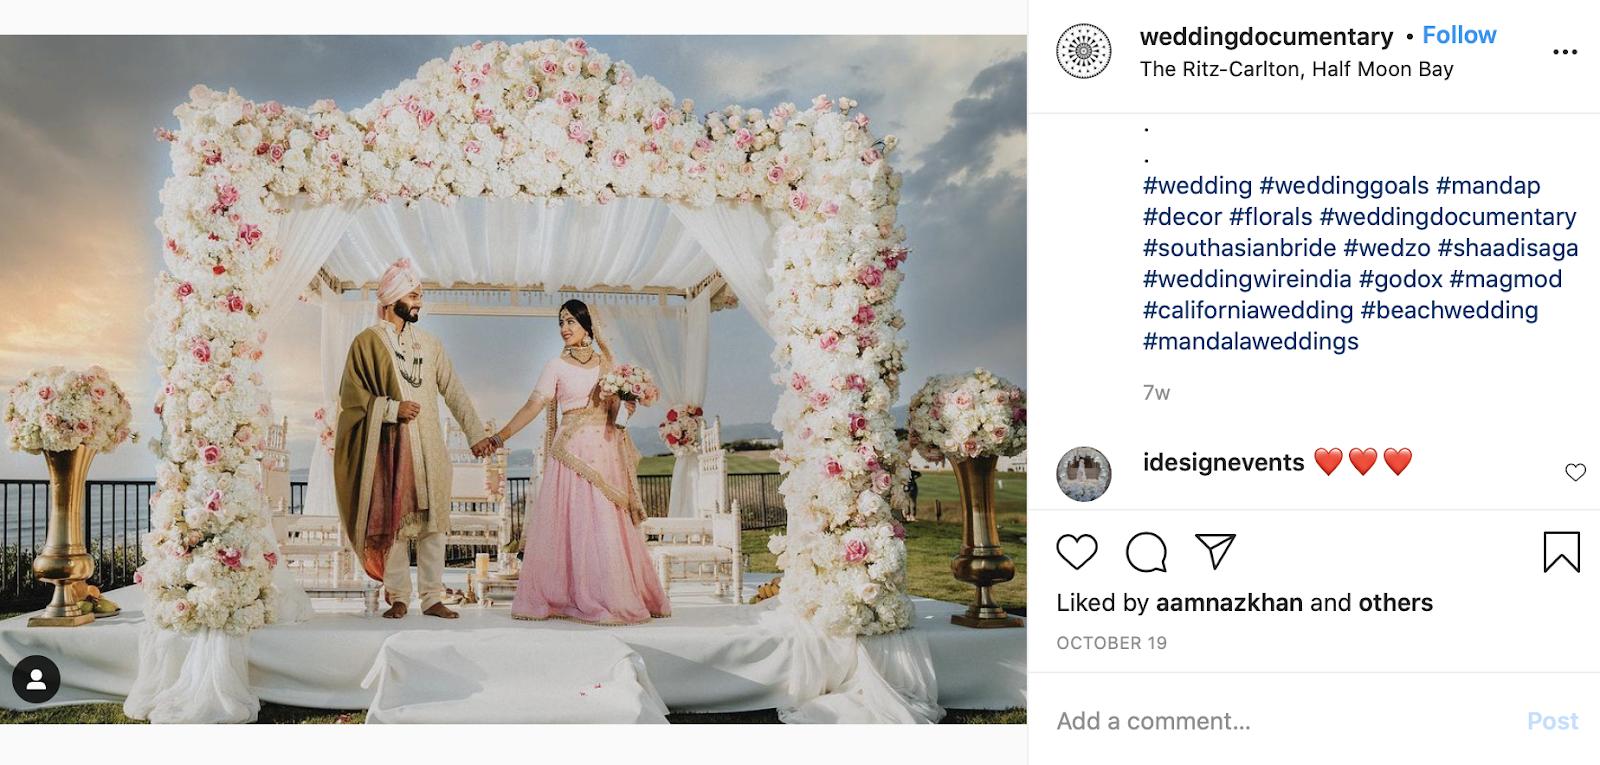 Mandap at Indian wedding ceremony